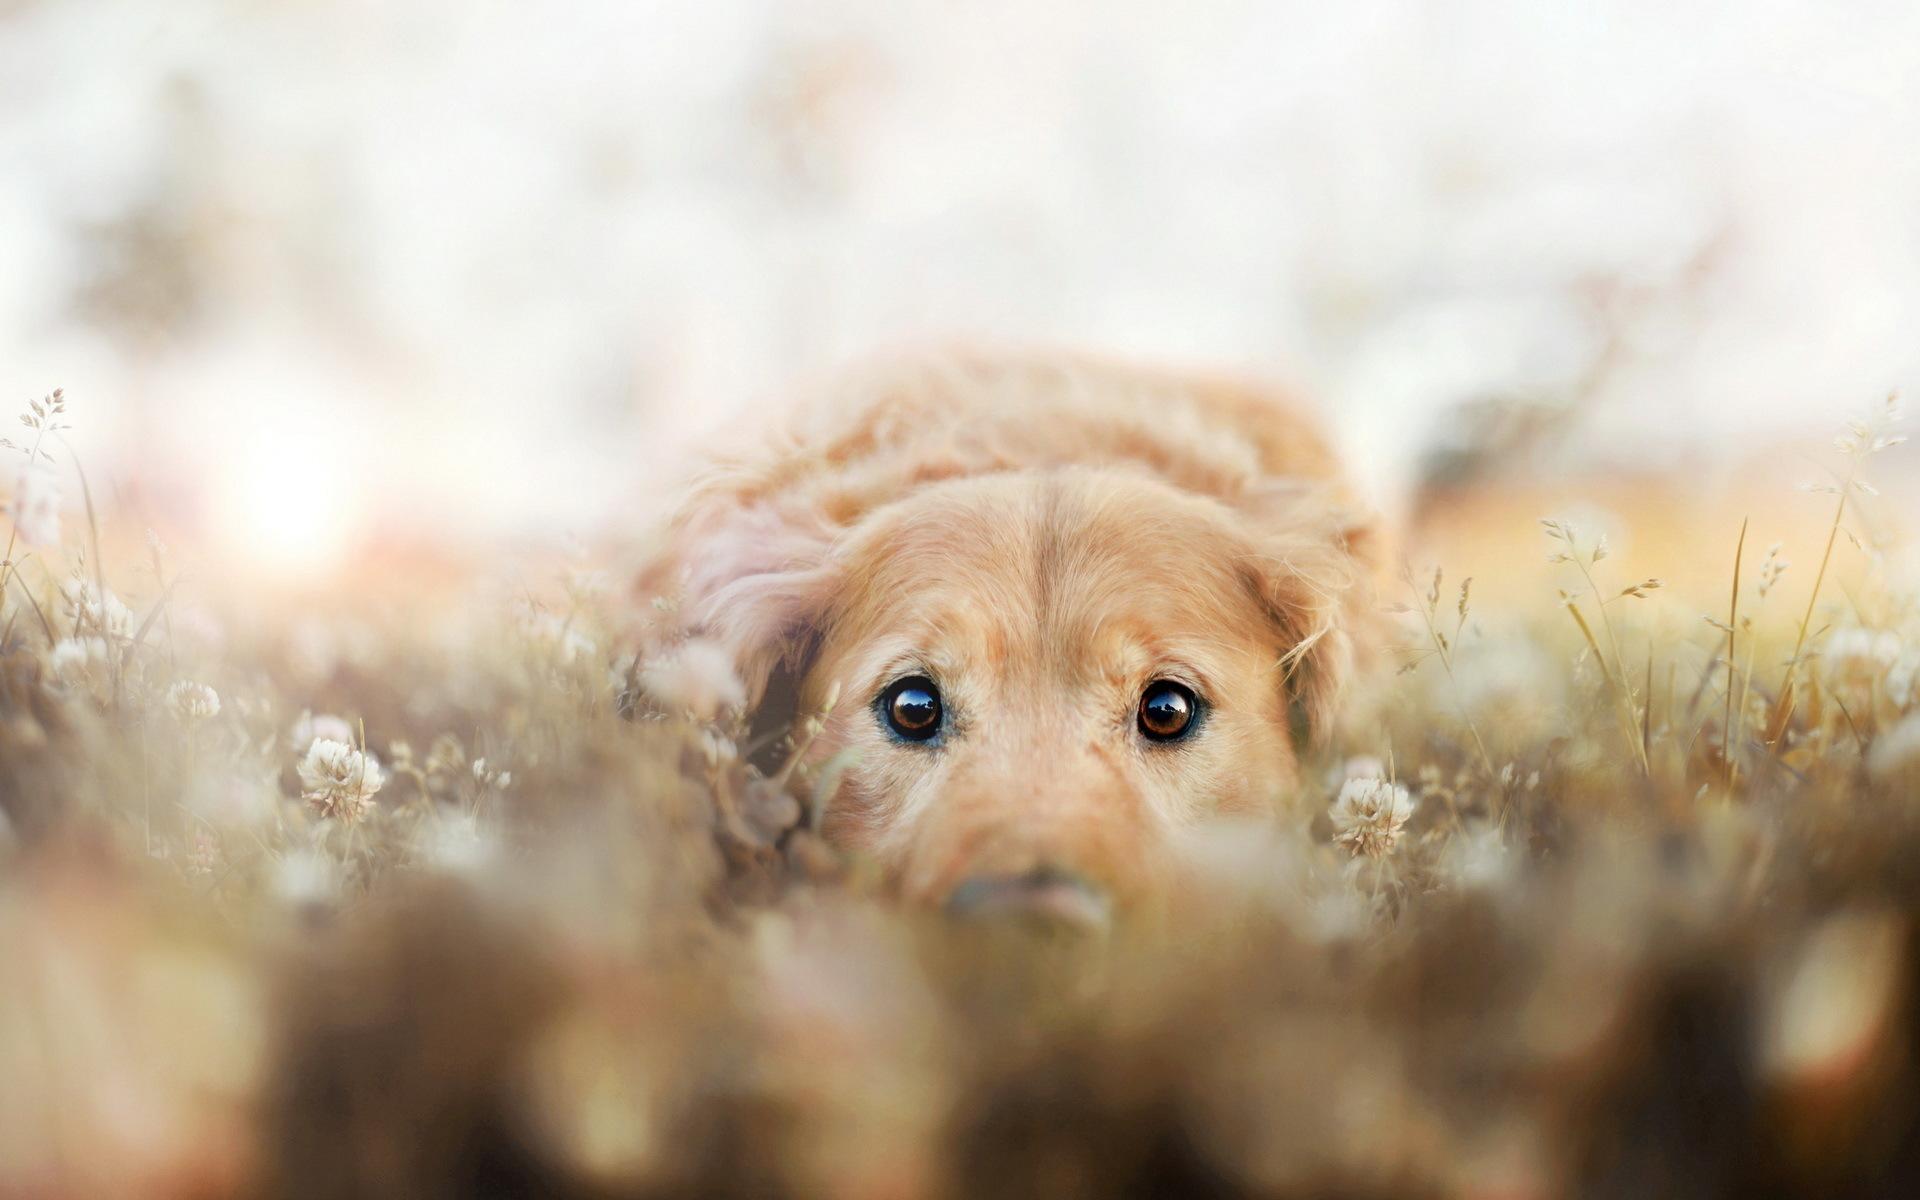 природа животные собака голова бесплатно